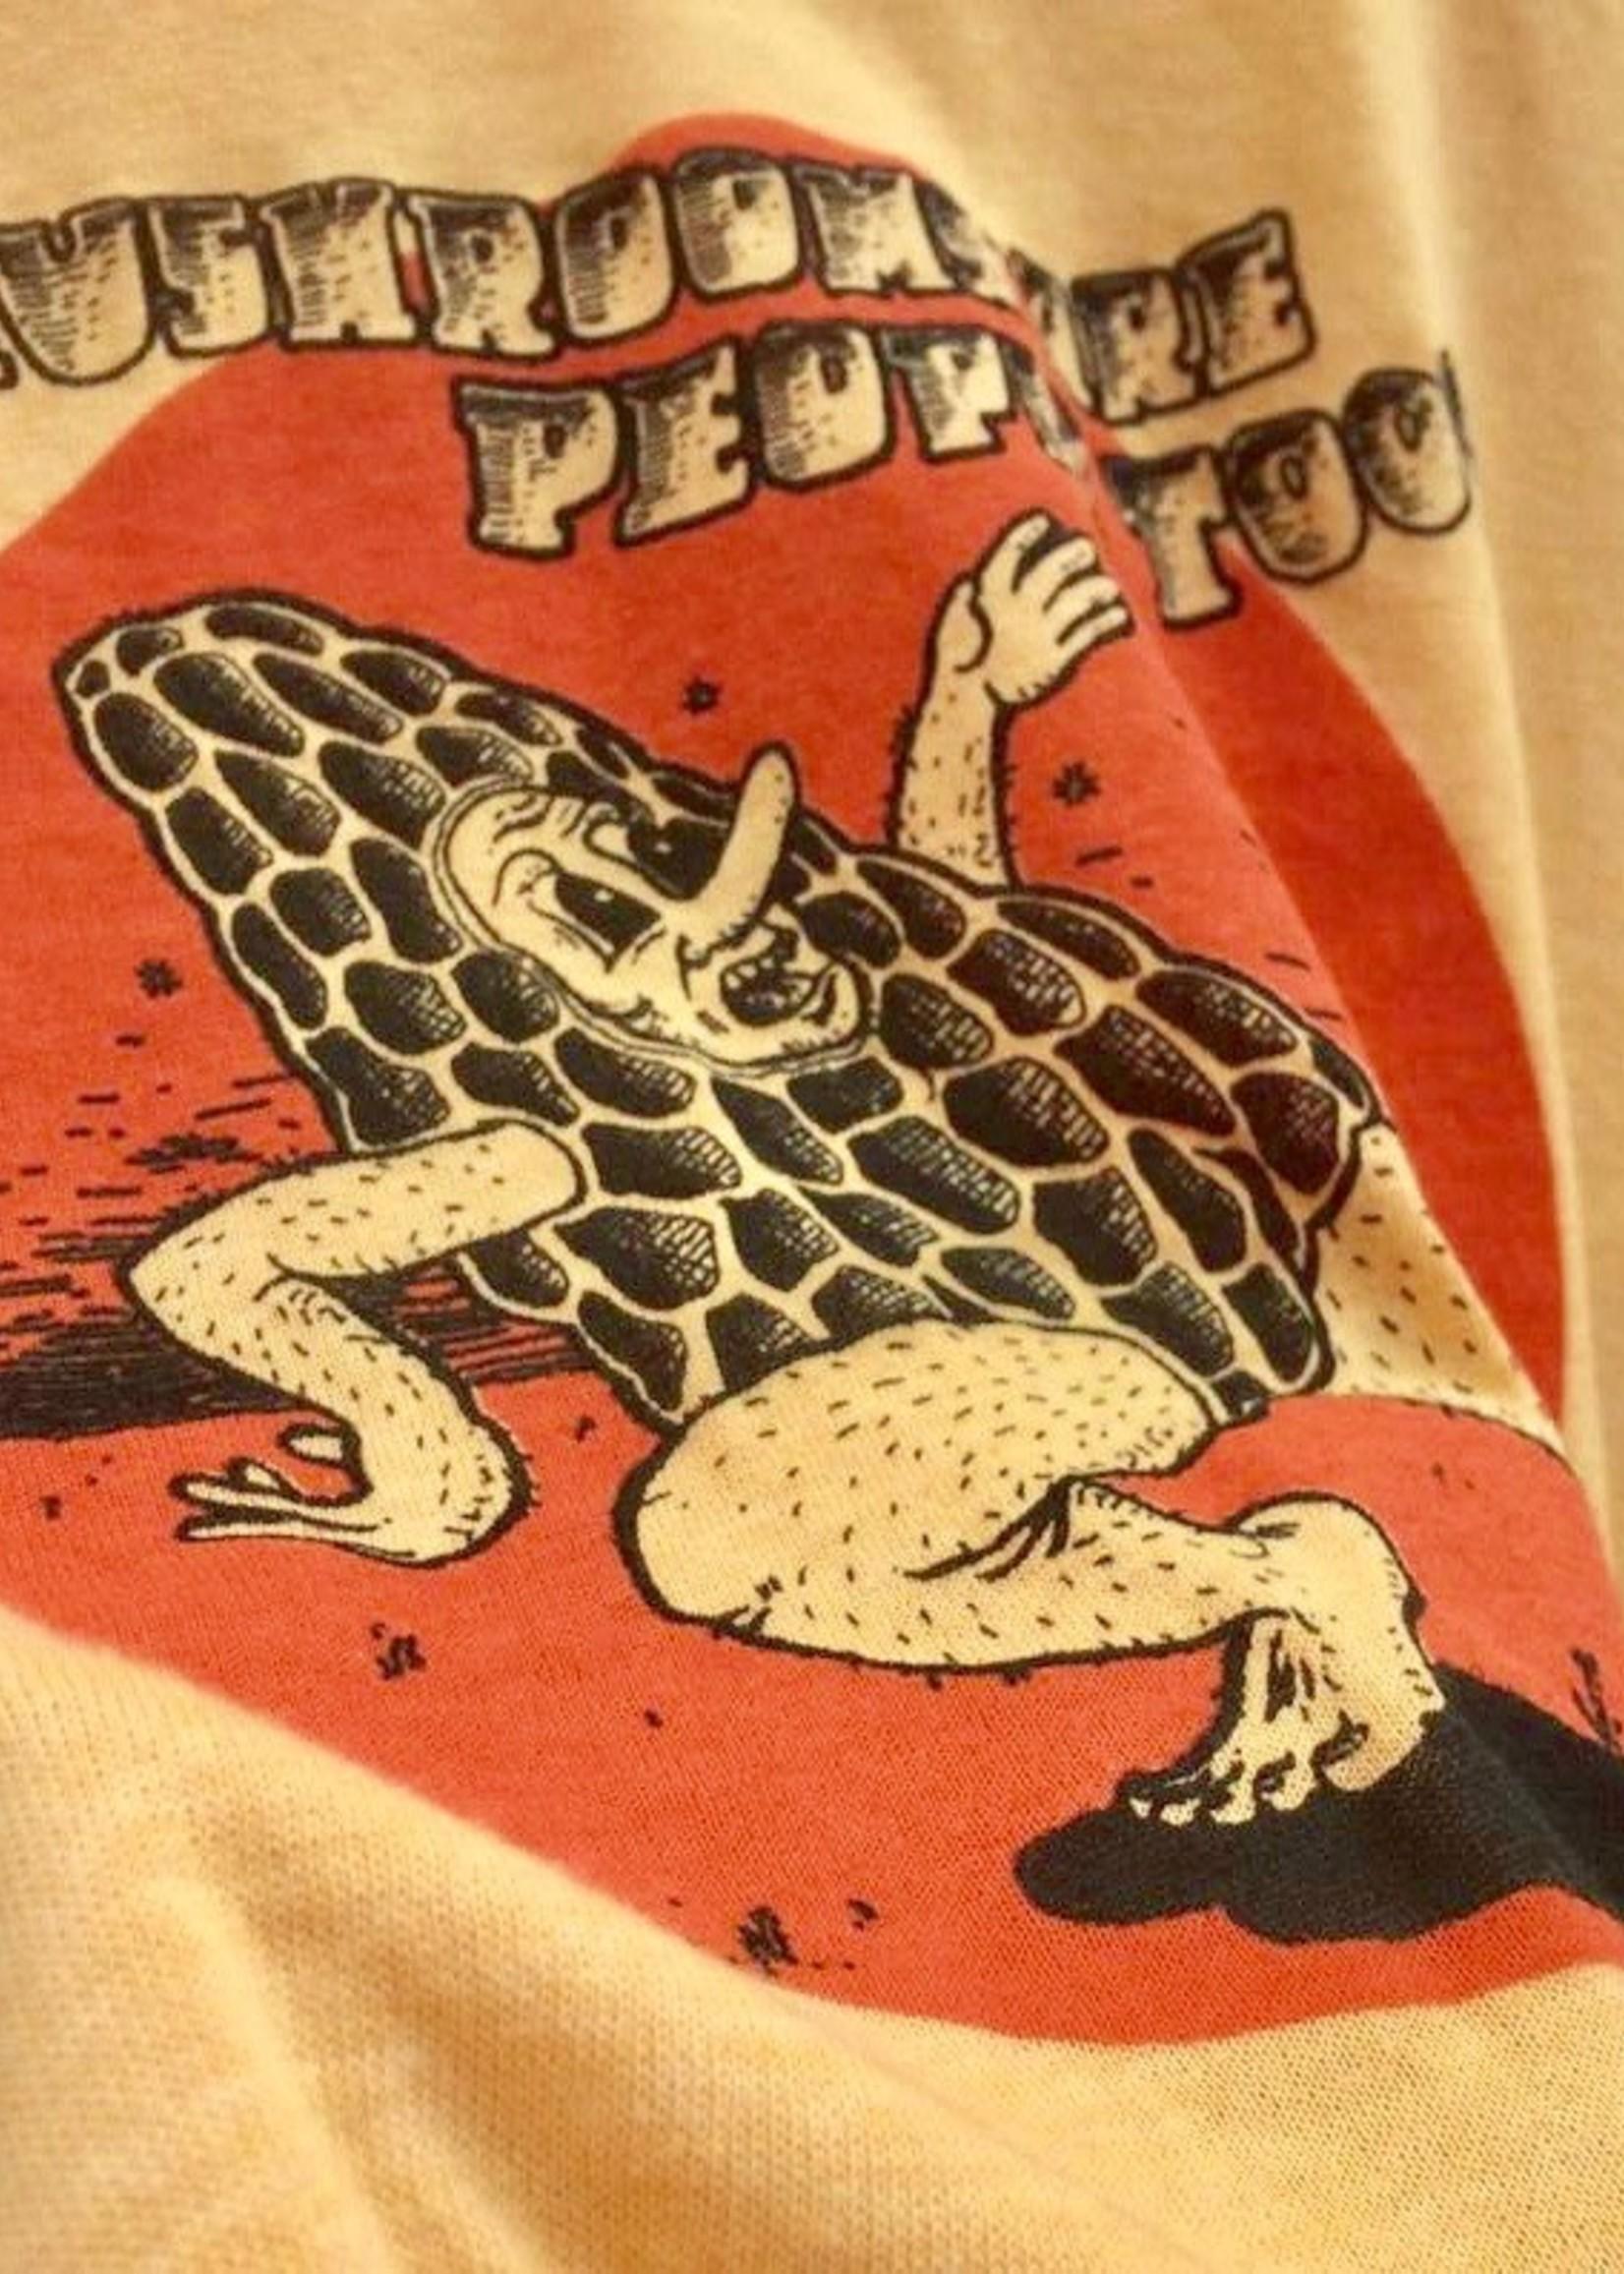 Corvidopolis Mushrooms are People T-shirt